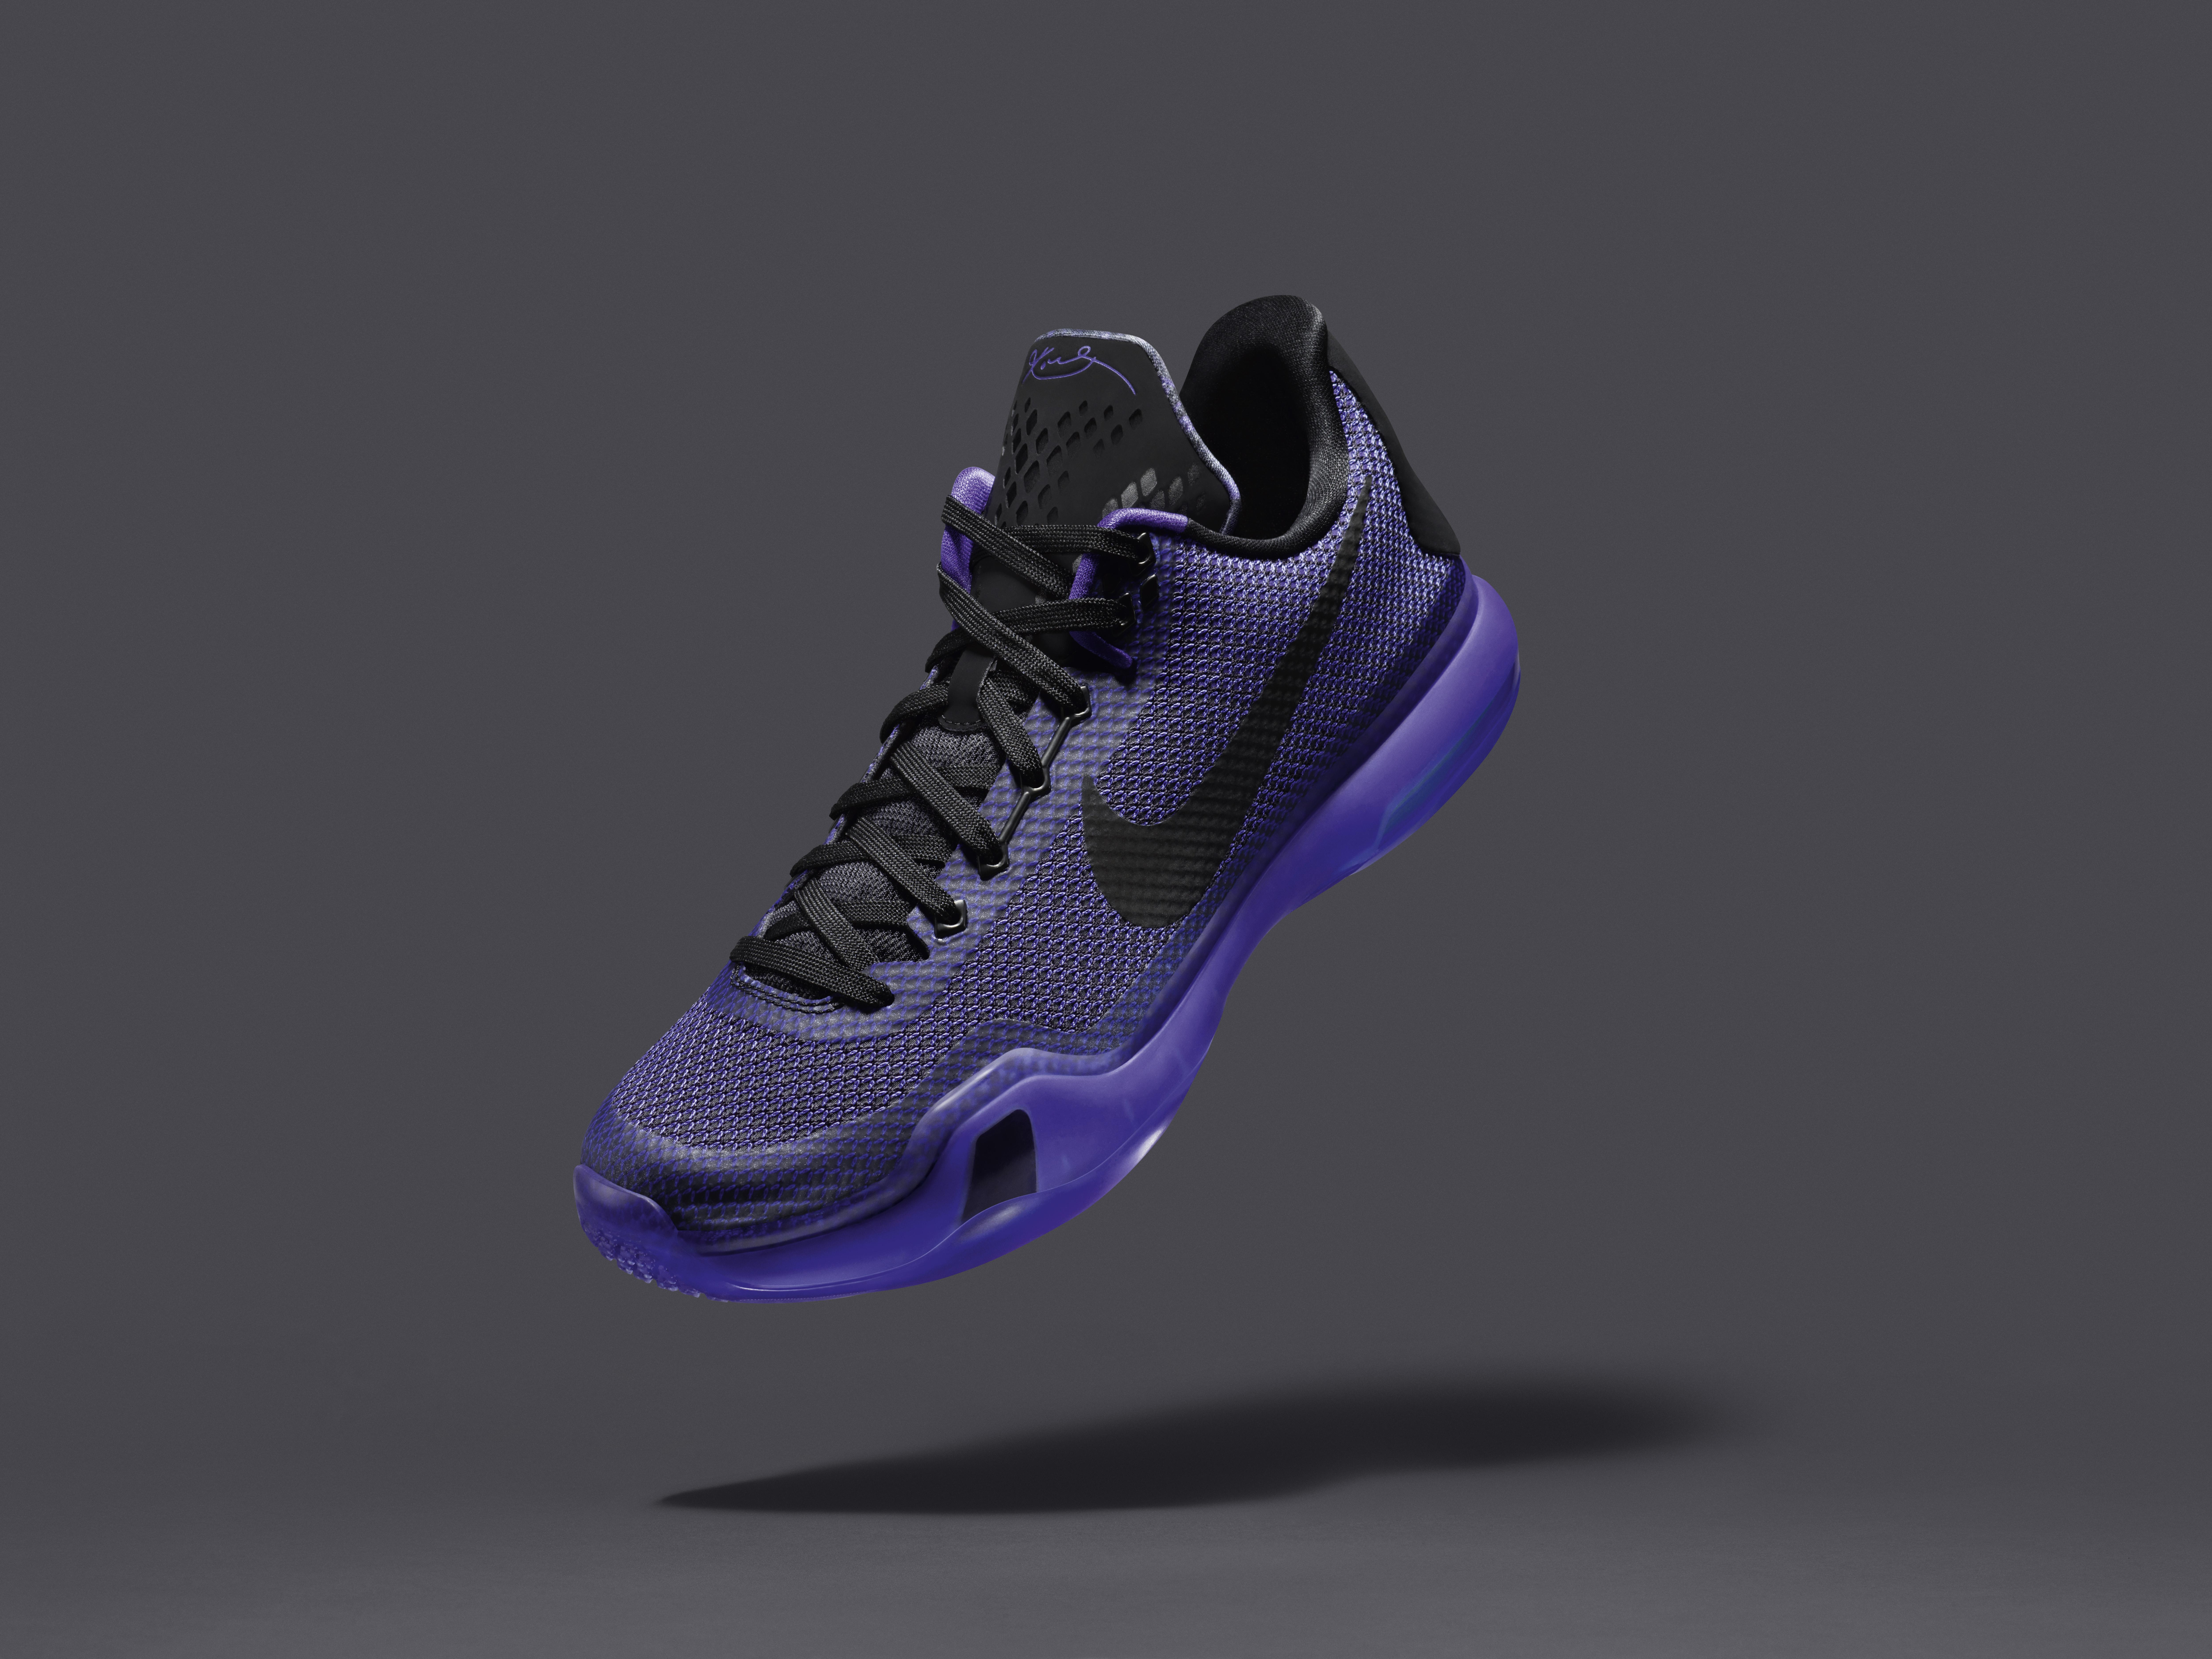 buy popular 923e4 bfa19 KOBE X Blackout Inspired by Kobe Bryant s Relentless Workouts - Nike News